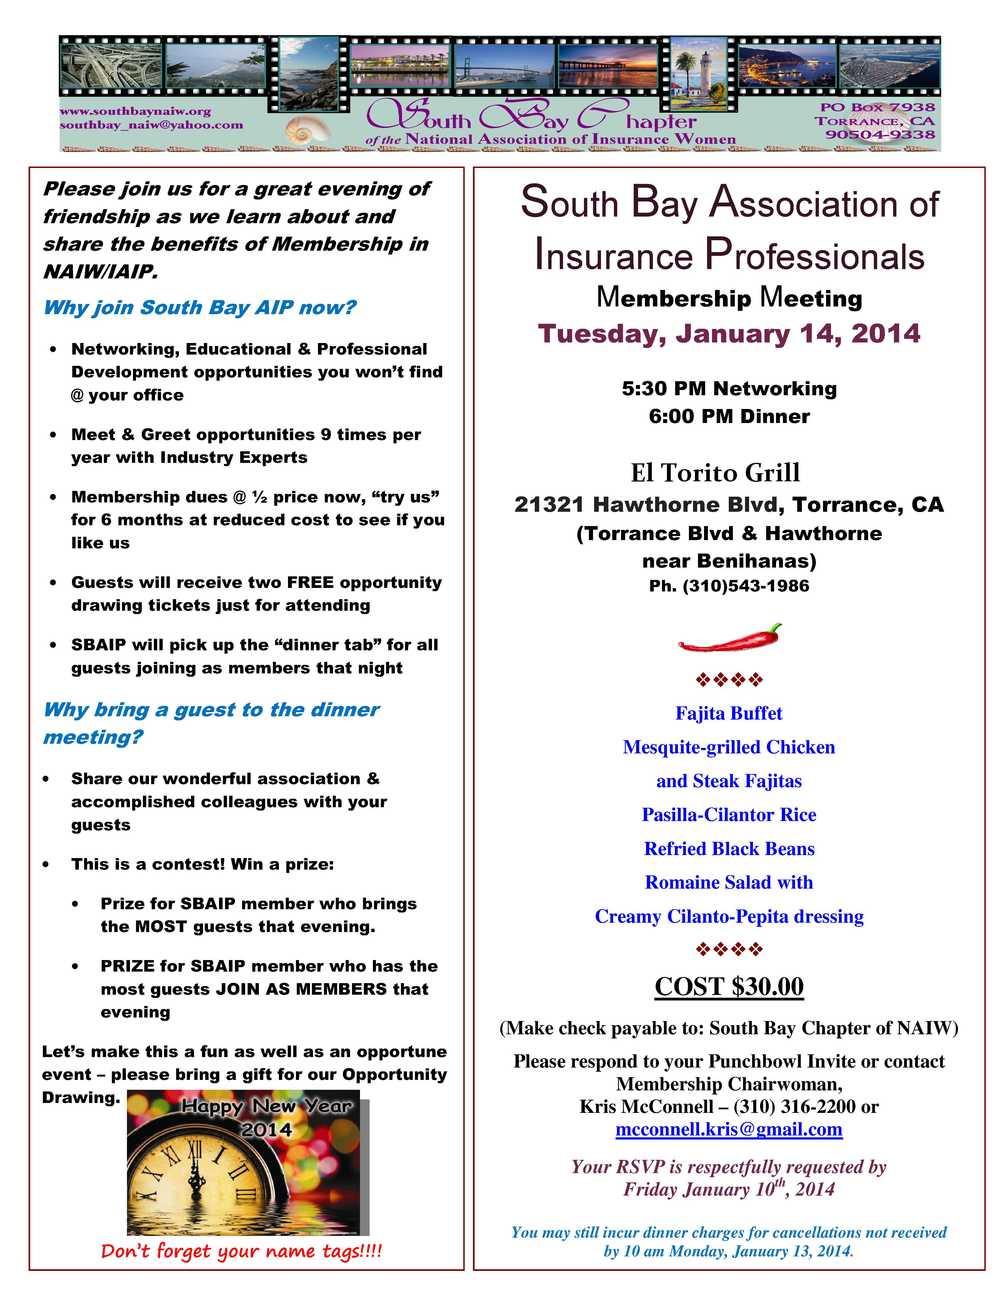 SouthBayNAIW_2014_01 14 2014_MembershipDinnerMeetingFlyer1.jpg